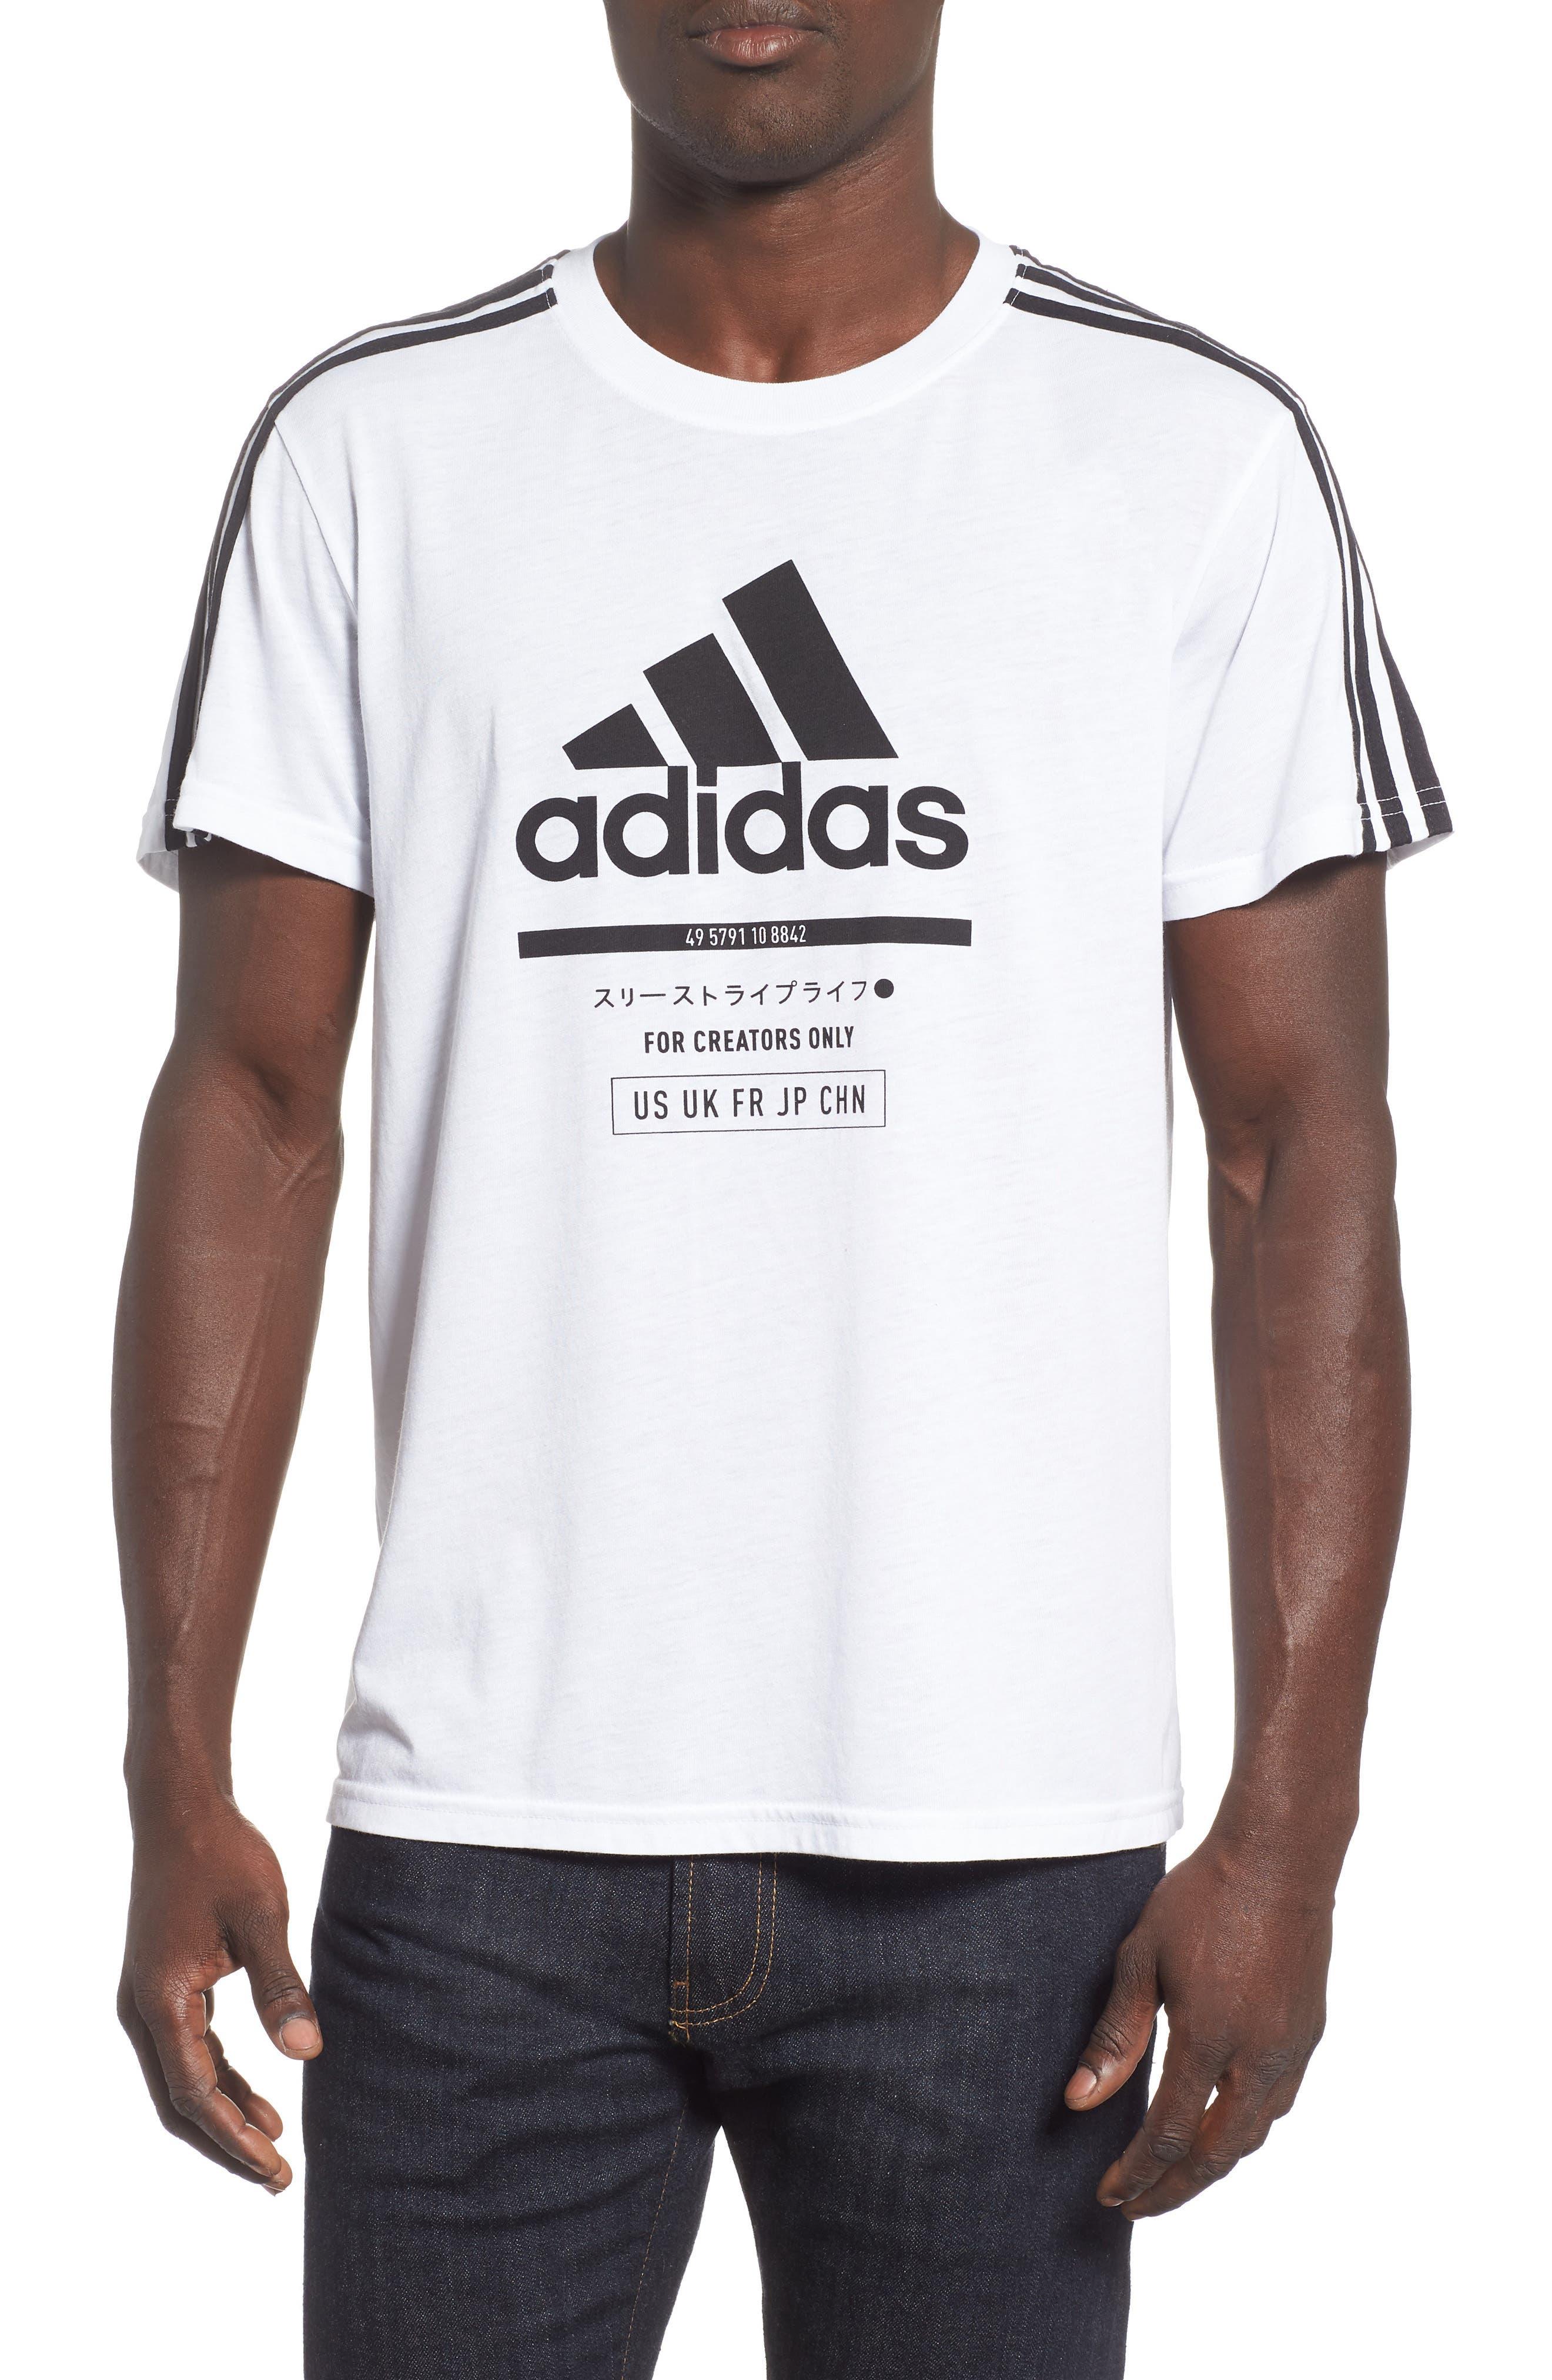 Adidas Classic International T-Shirt, White